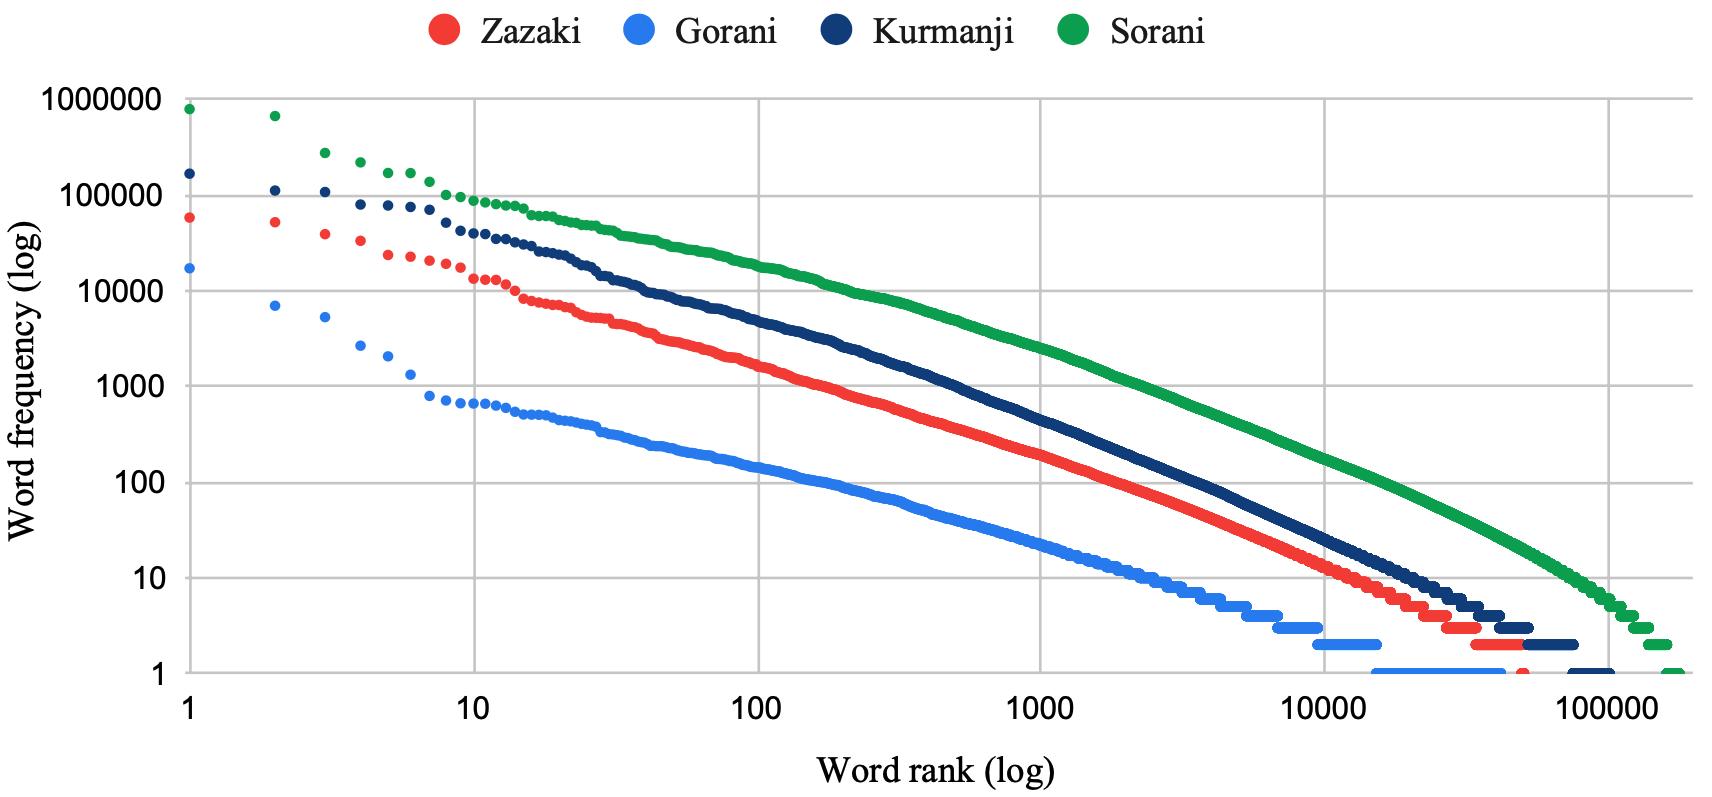 Zaza-Gorani corpus